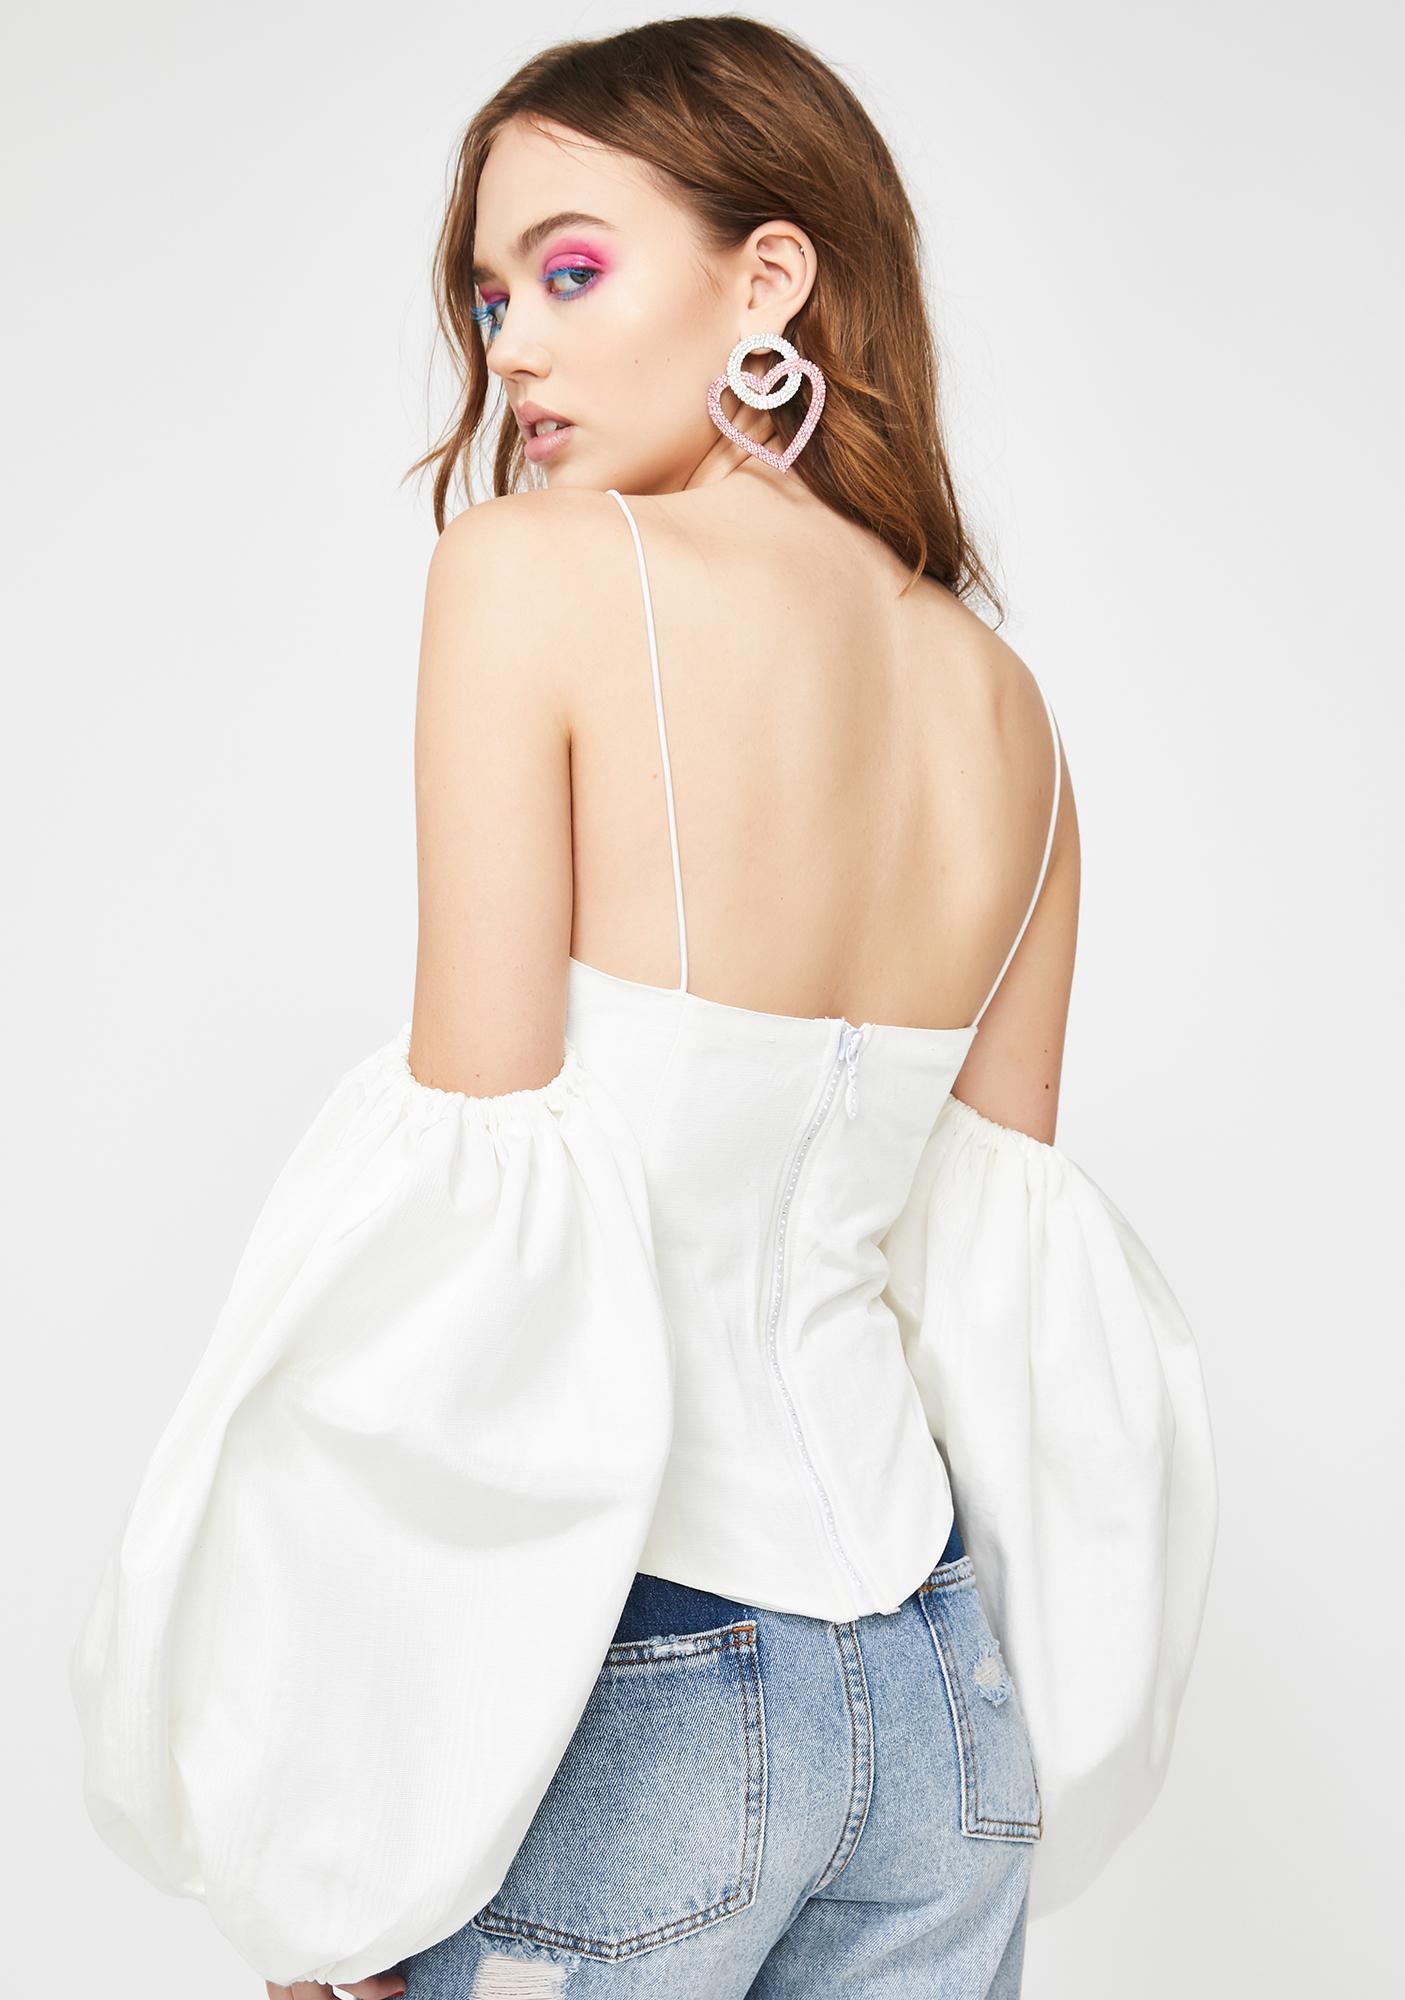 For Love & Lemons Celeste Moire Cold Shoulder Top